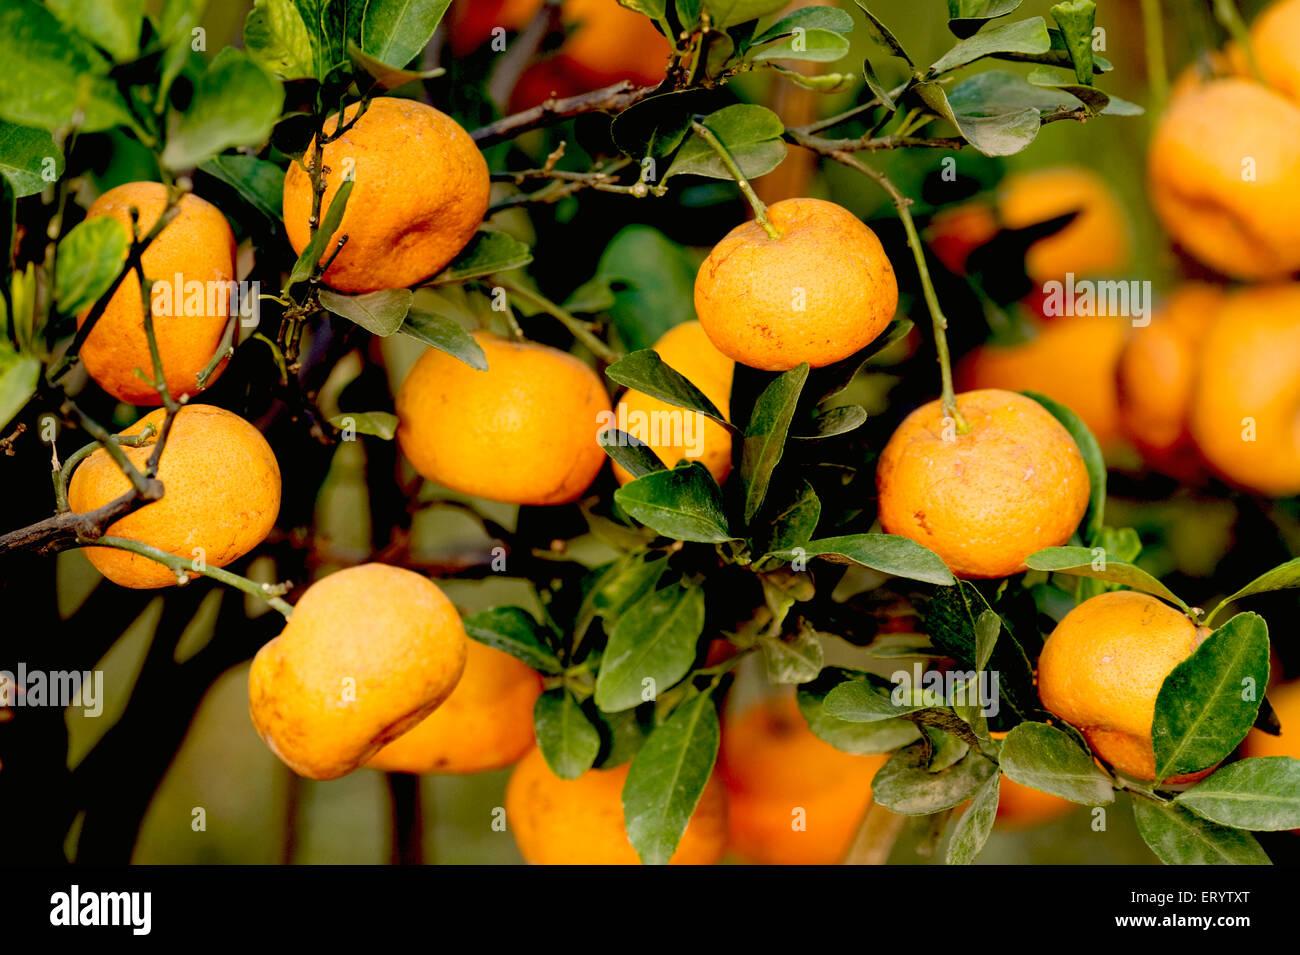 Fruits ; oranges hanging on tree ; Darjeeling ; West Bengal ; India - Stock Image